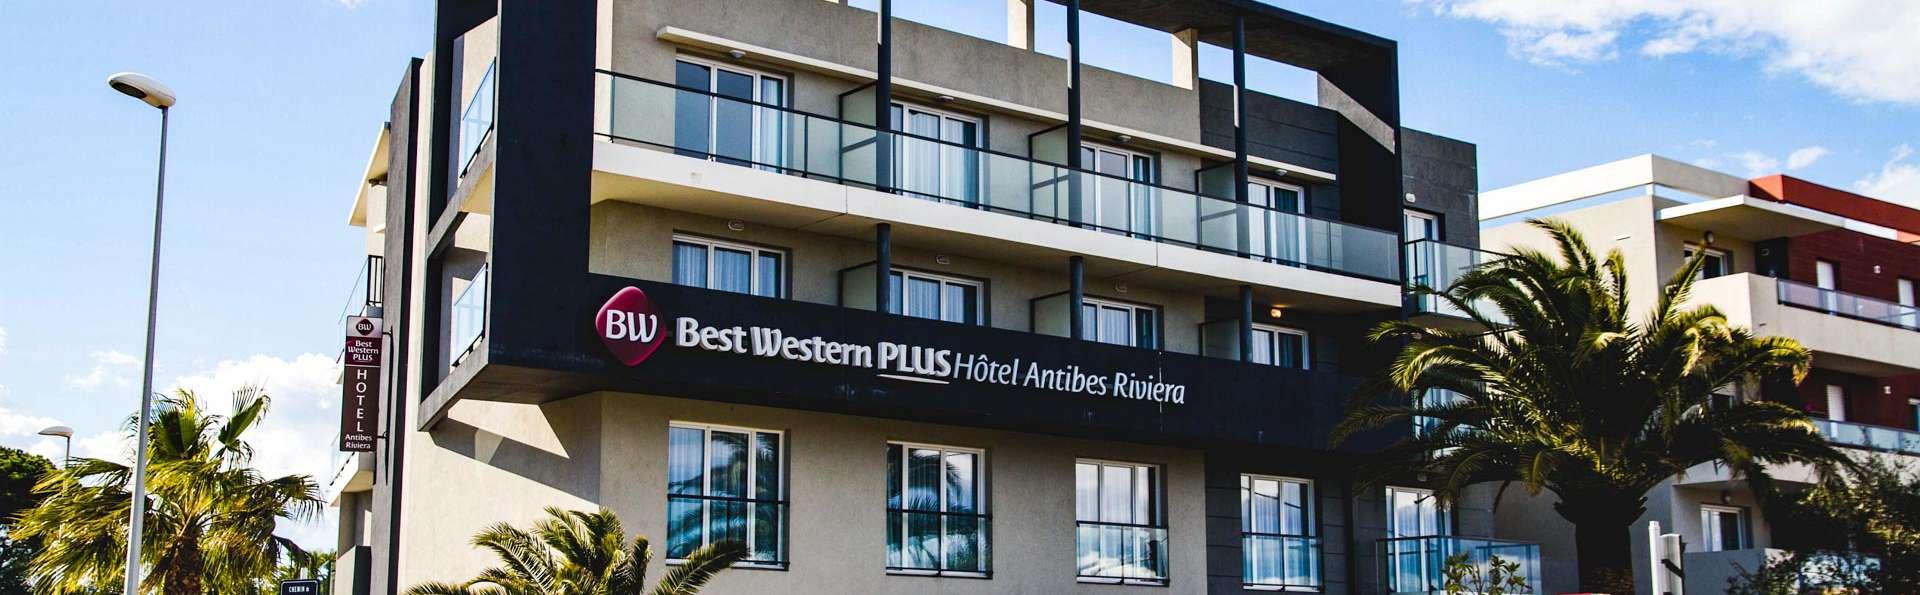 Best Western Plus Antibes Riviera - EDIT_FRONT_03.jpg